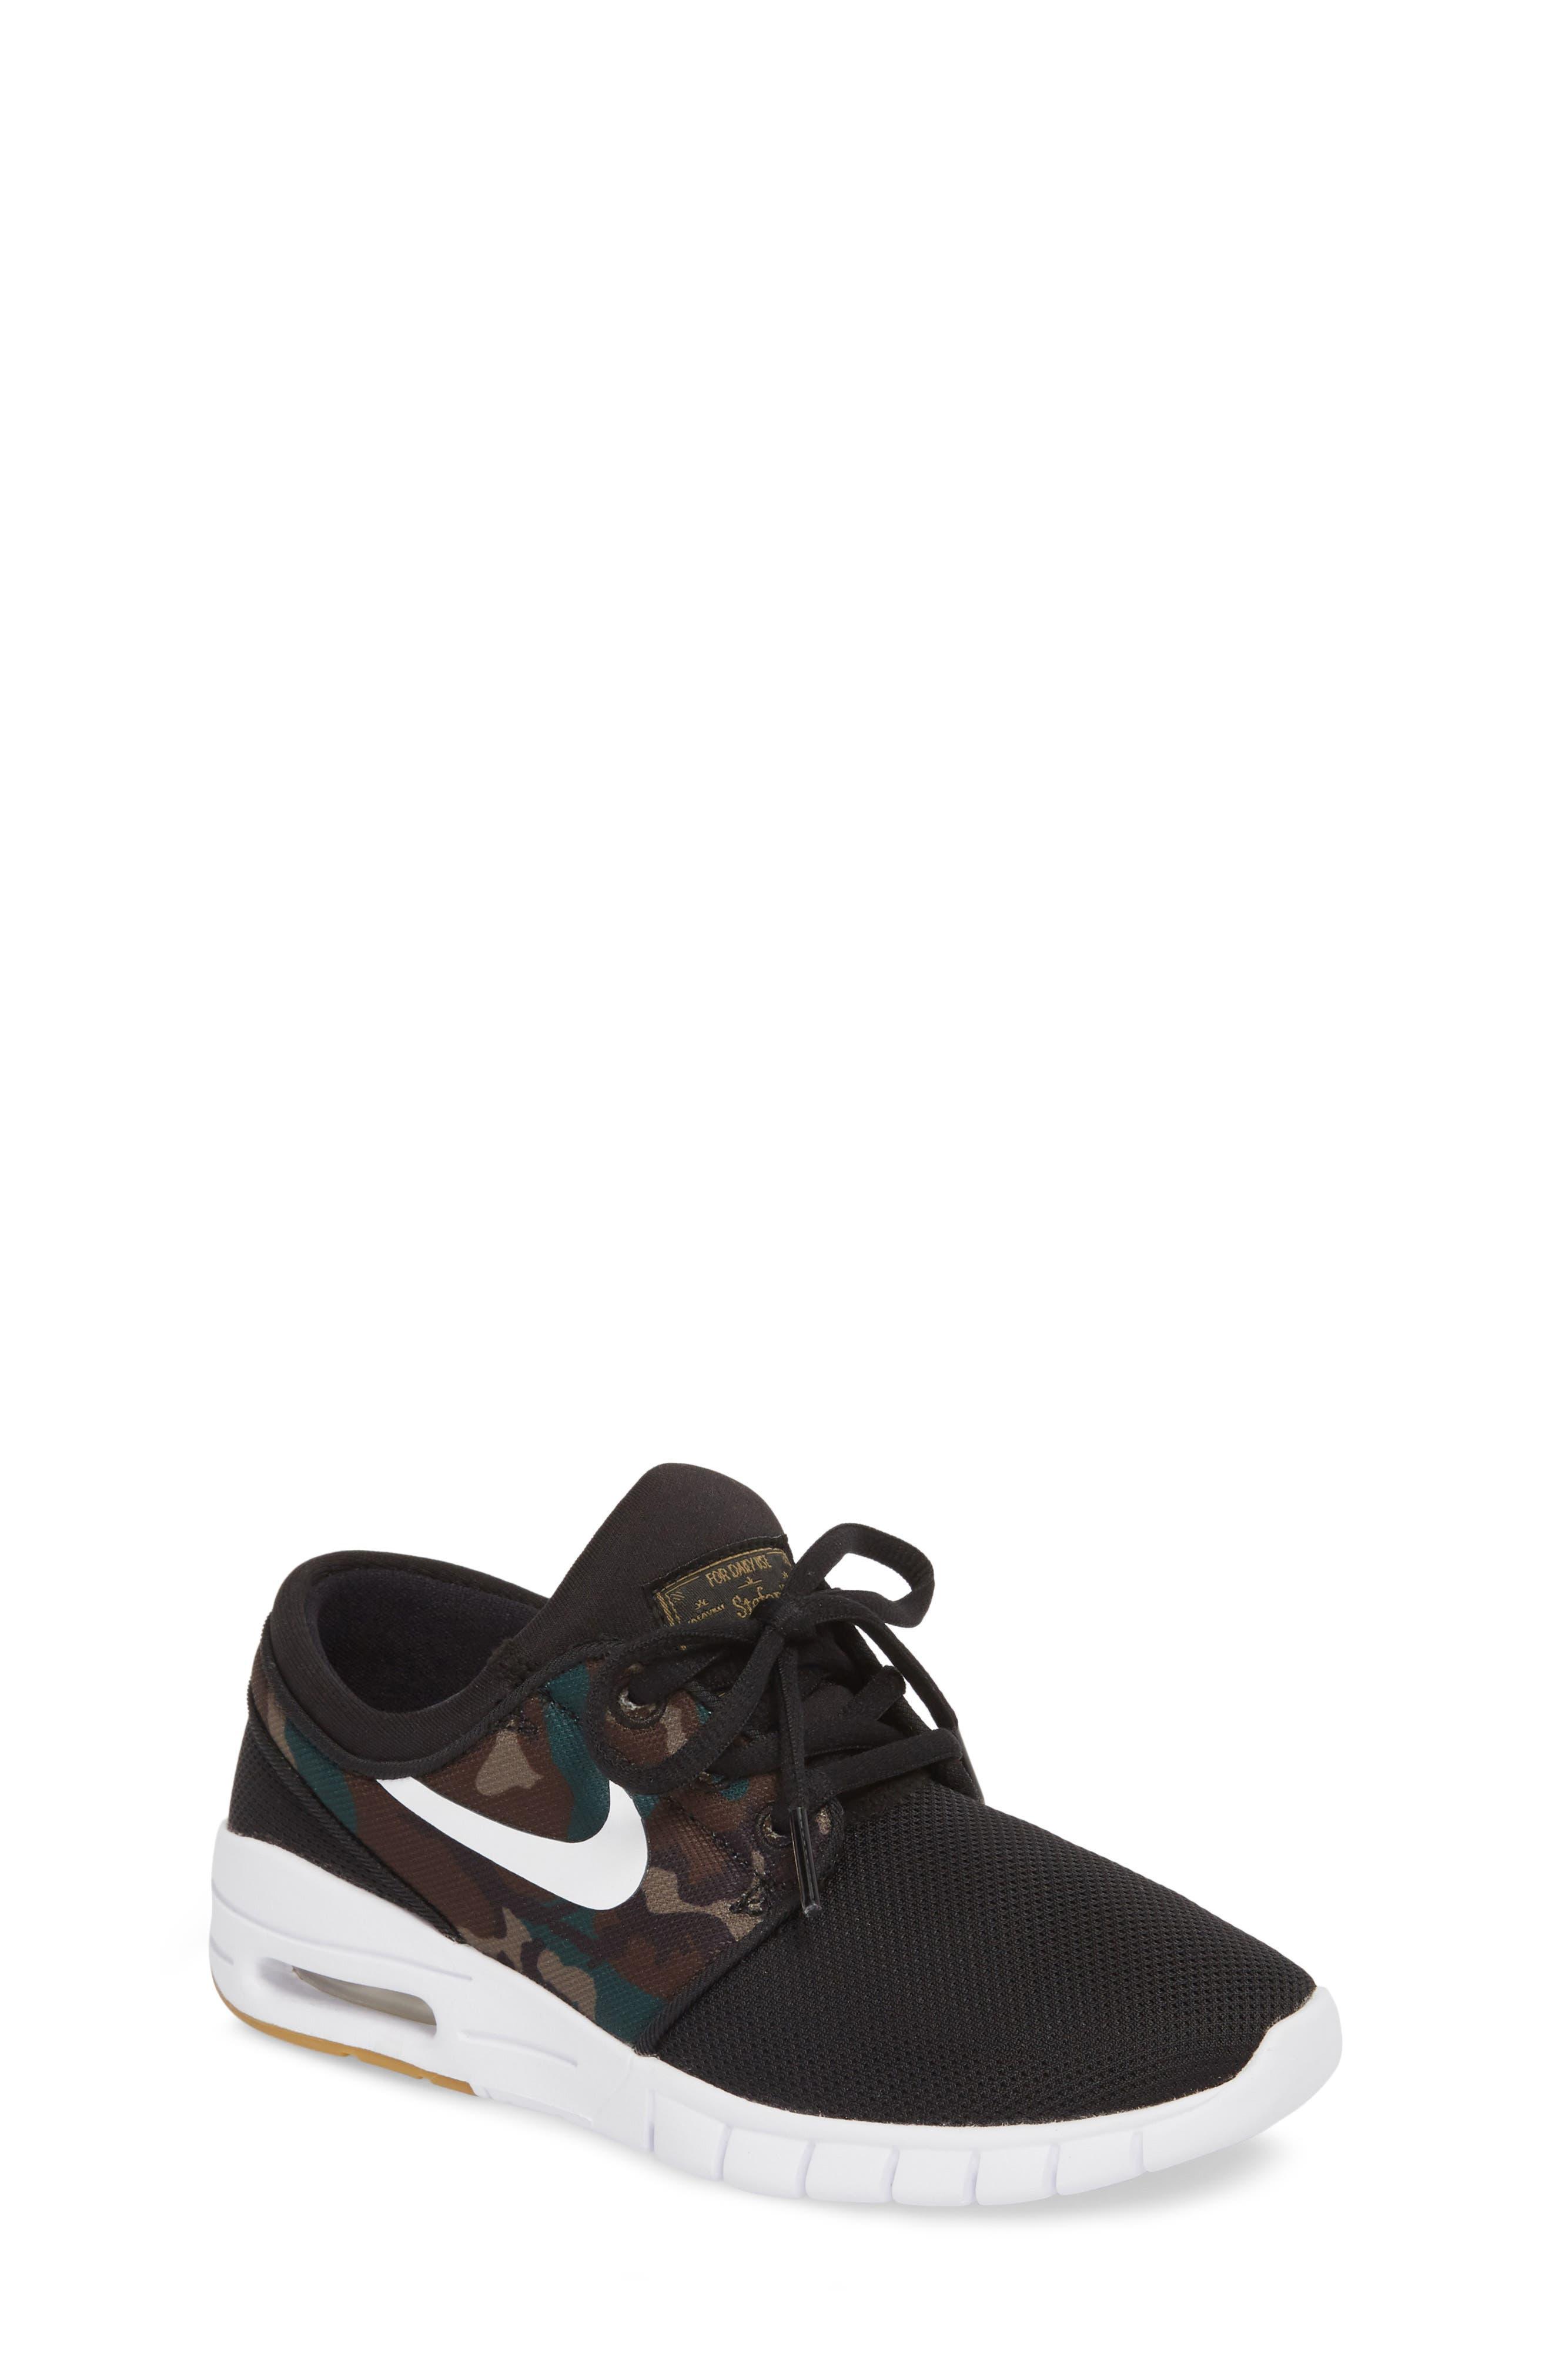 Stefan Janoski Max SB Skate Sneaker,                             Main thumbnail 1, color,                             Black/ White/ Olive/ Brown